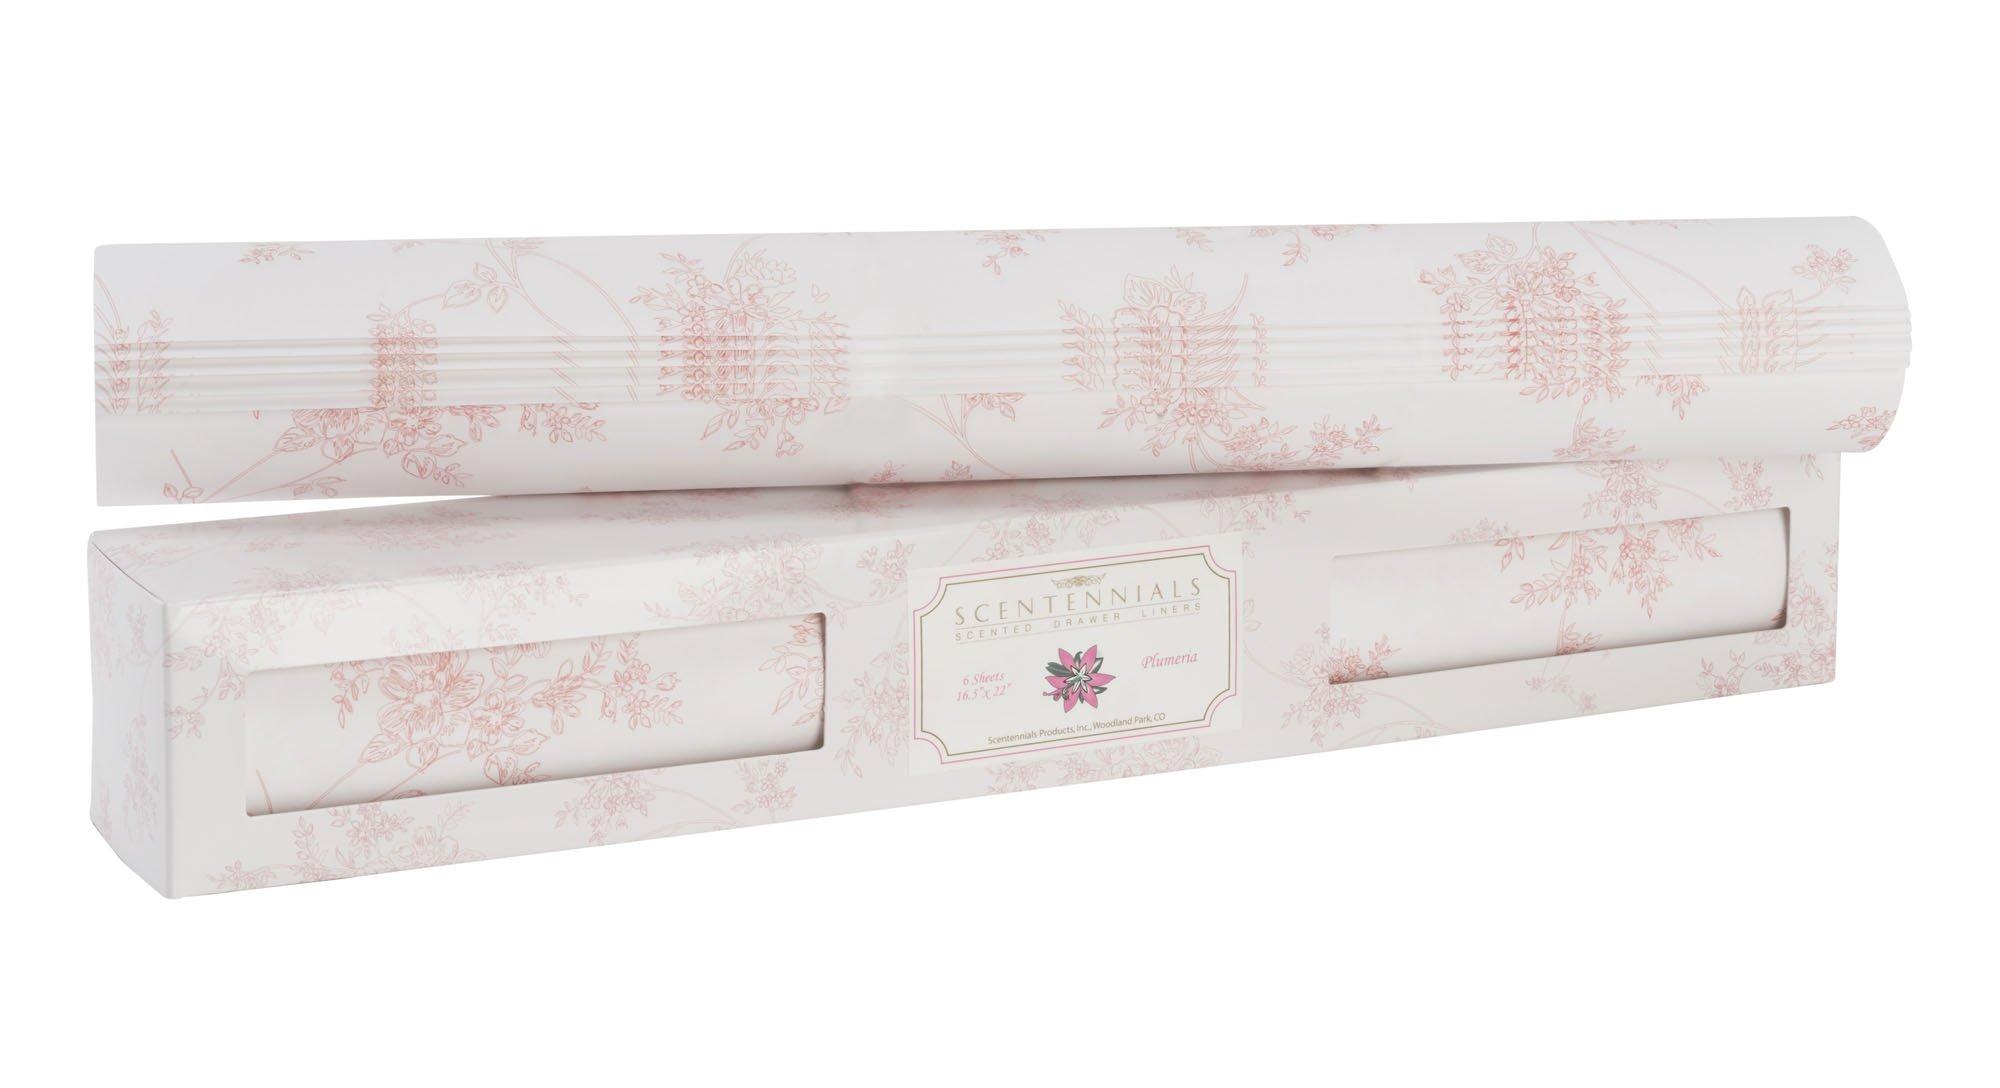 Scentennials Original Series PLUMERIA (18 SHEETS) Scented Fragrant Shelf & Drawer Liners 16.5'' x 22'' - Great for Dresser, Kitchen, Bathroom, Vanity & Linen Closet